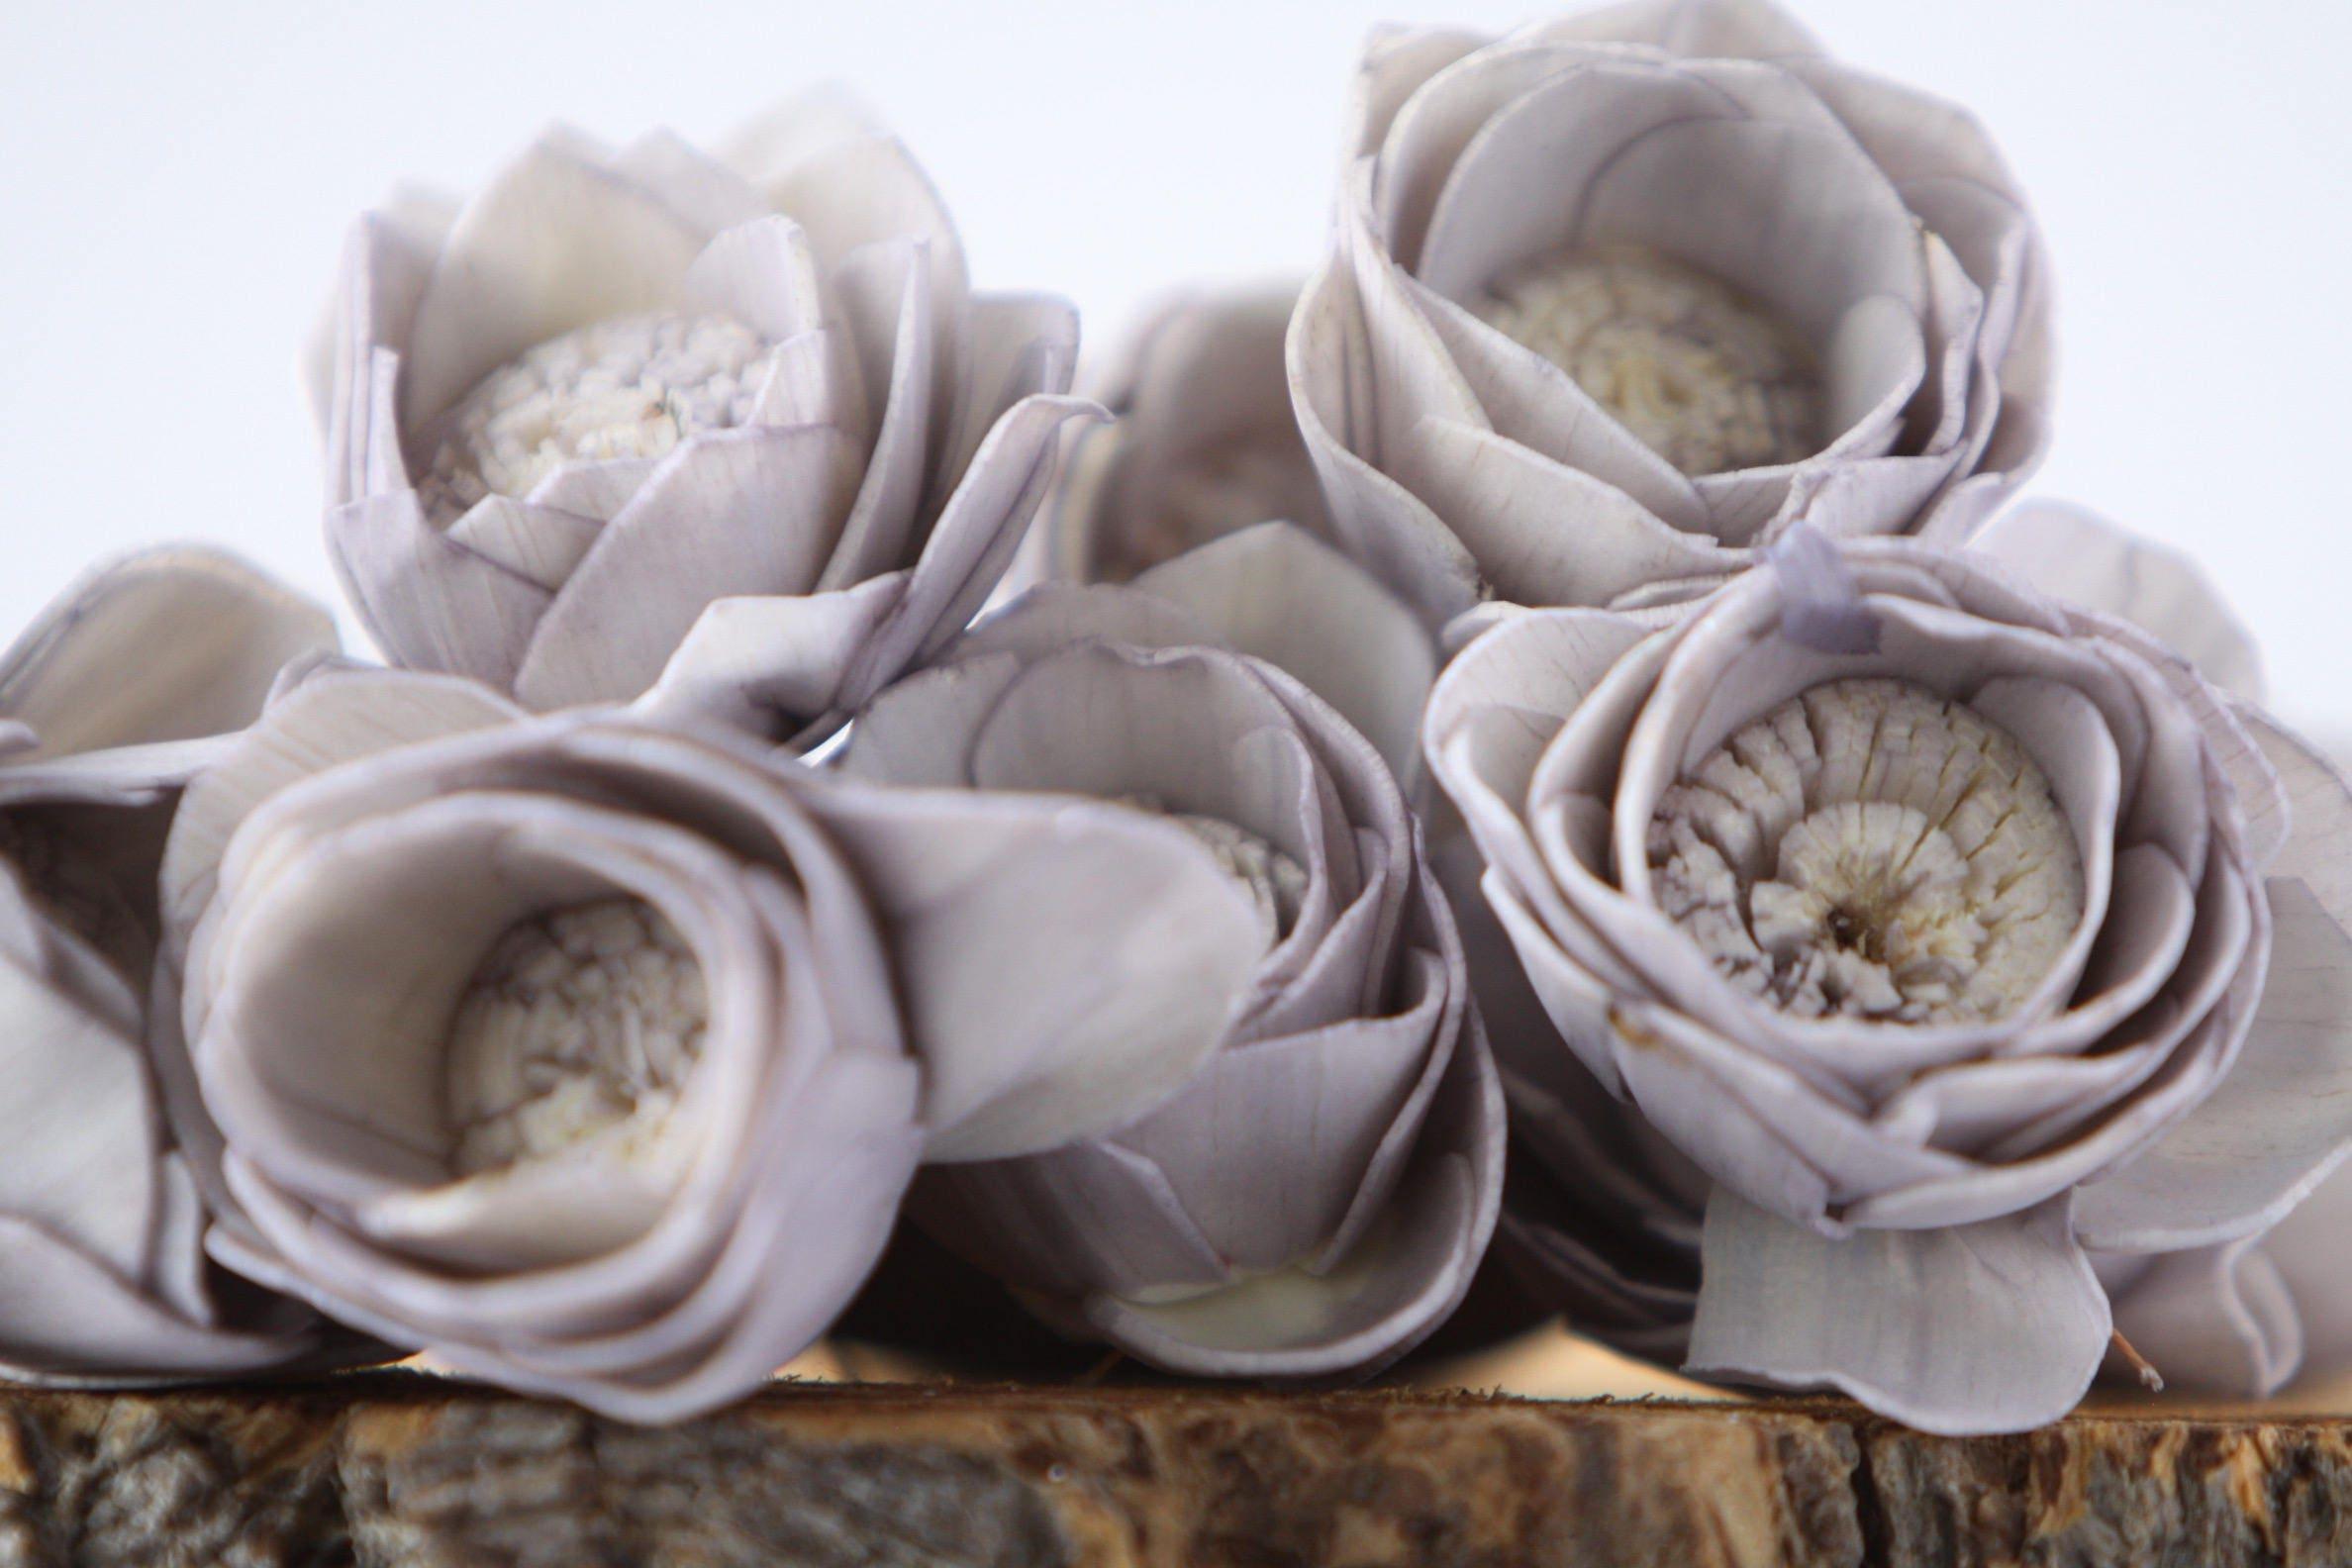 Grey camellia sola flowers set of 10 gray sola flowers wood sola grey camellia sola flowers set of 10 gray sola flowers wood sola flowers camelia sola wedding diy grey crafting flowers craft izmirmasajfo